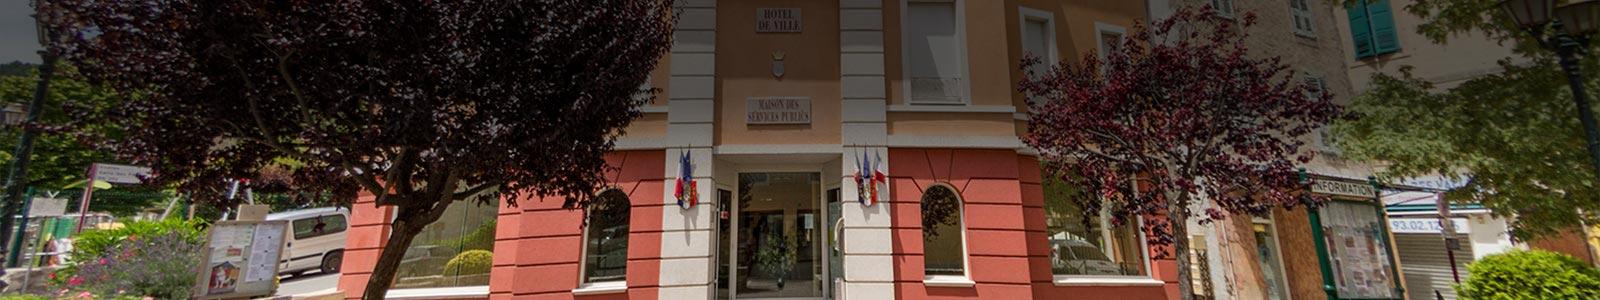 Mairie Puget Théniers